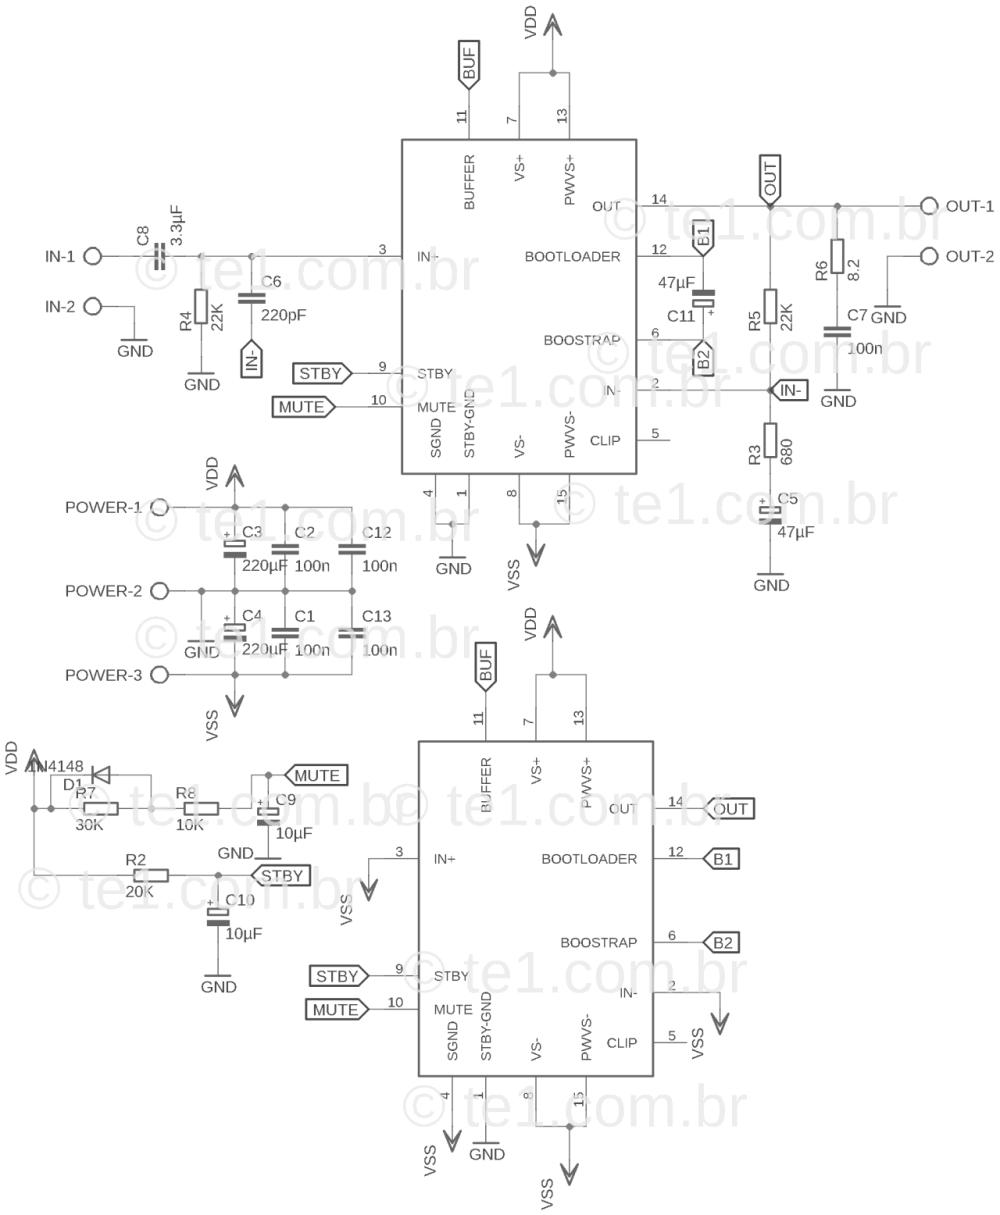 medium resolution of tda7293 in parallel schematic circuit